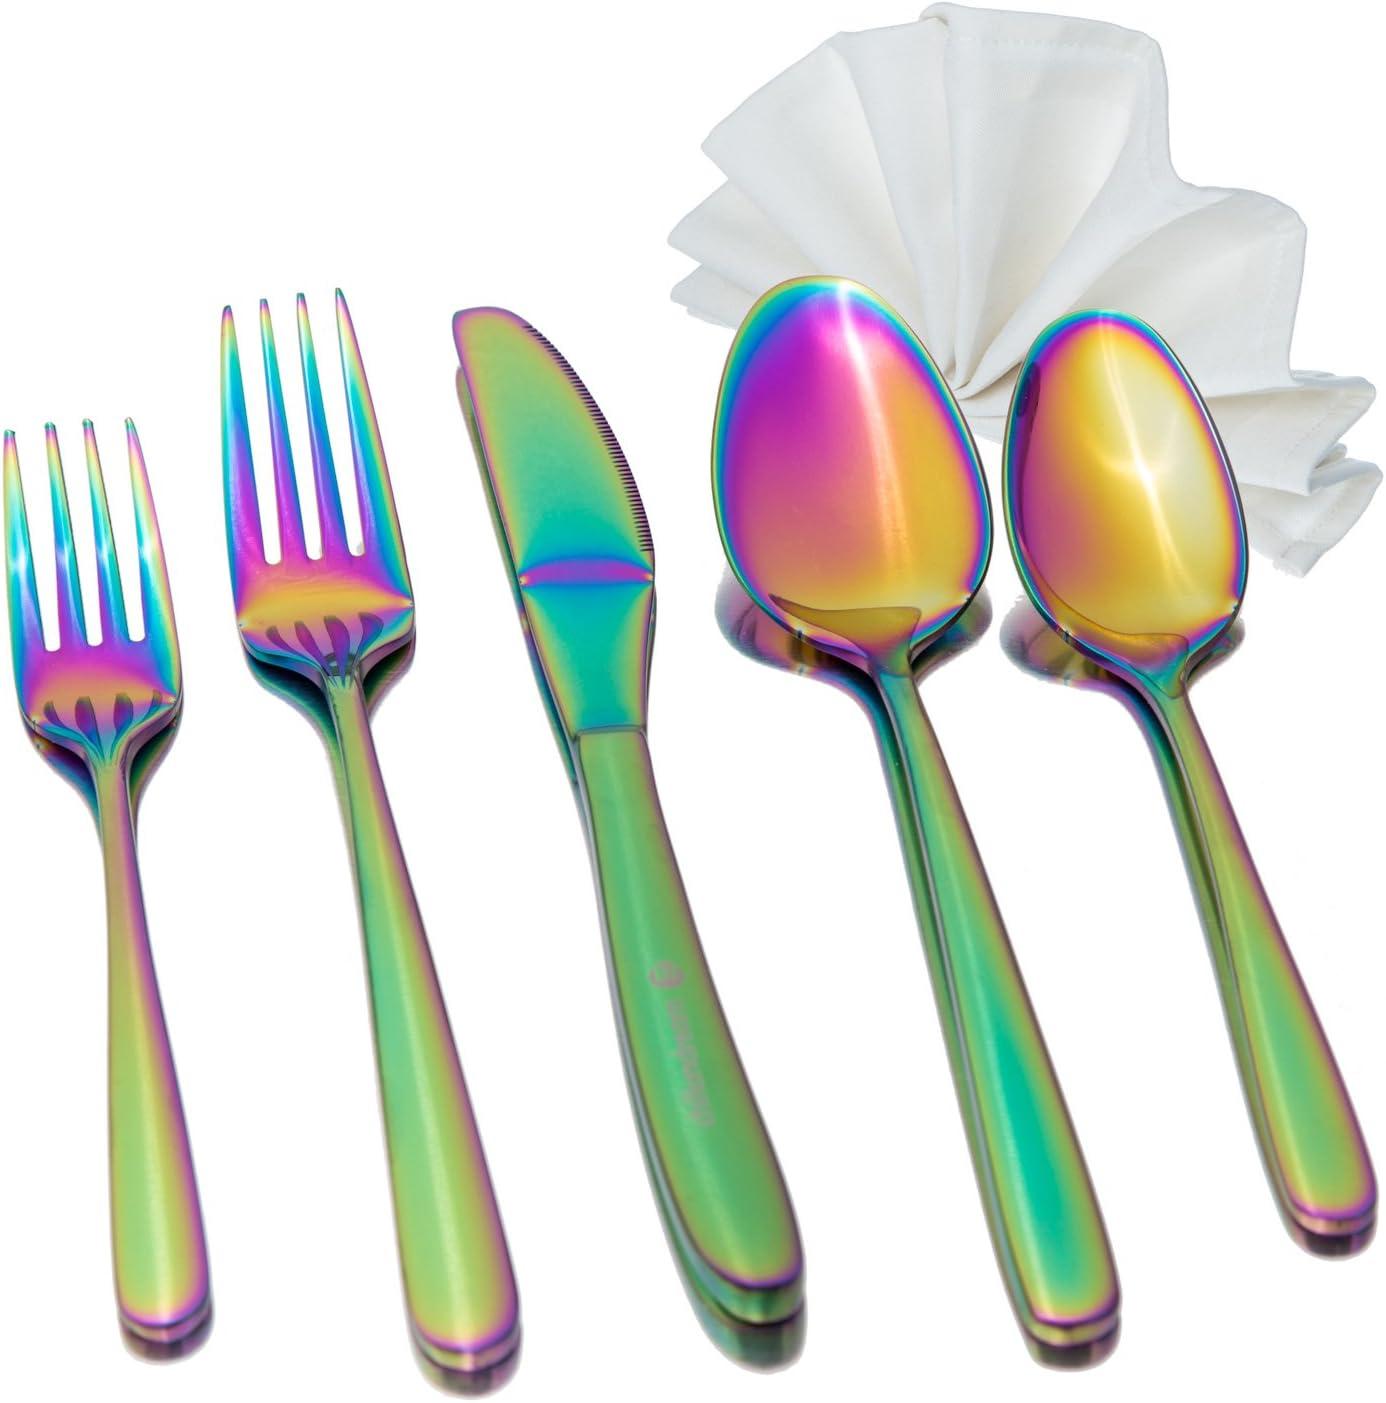 Rainbow Flatware San Jose Mall Set with Napkin Virginia Beach Mall 5 8 18 Stainless piece Premium